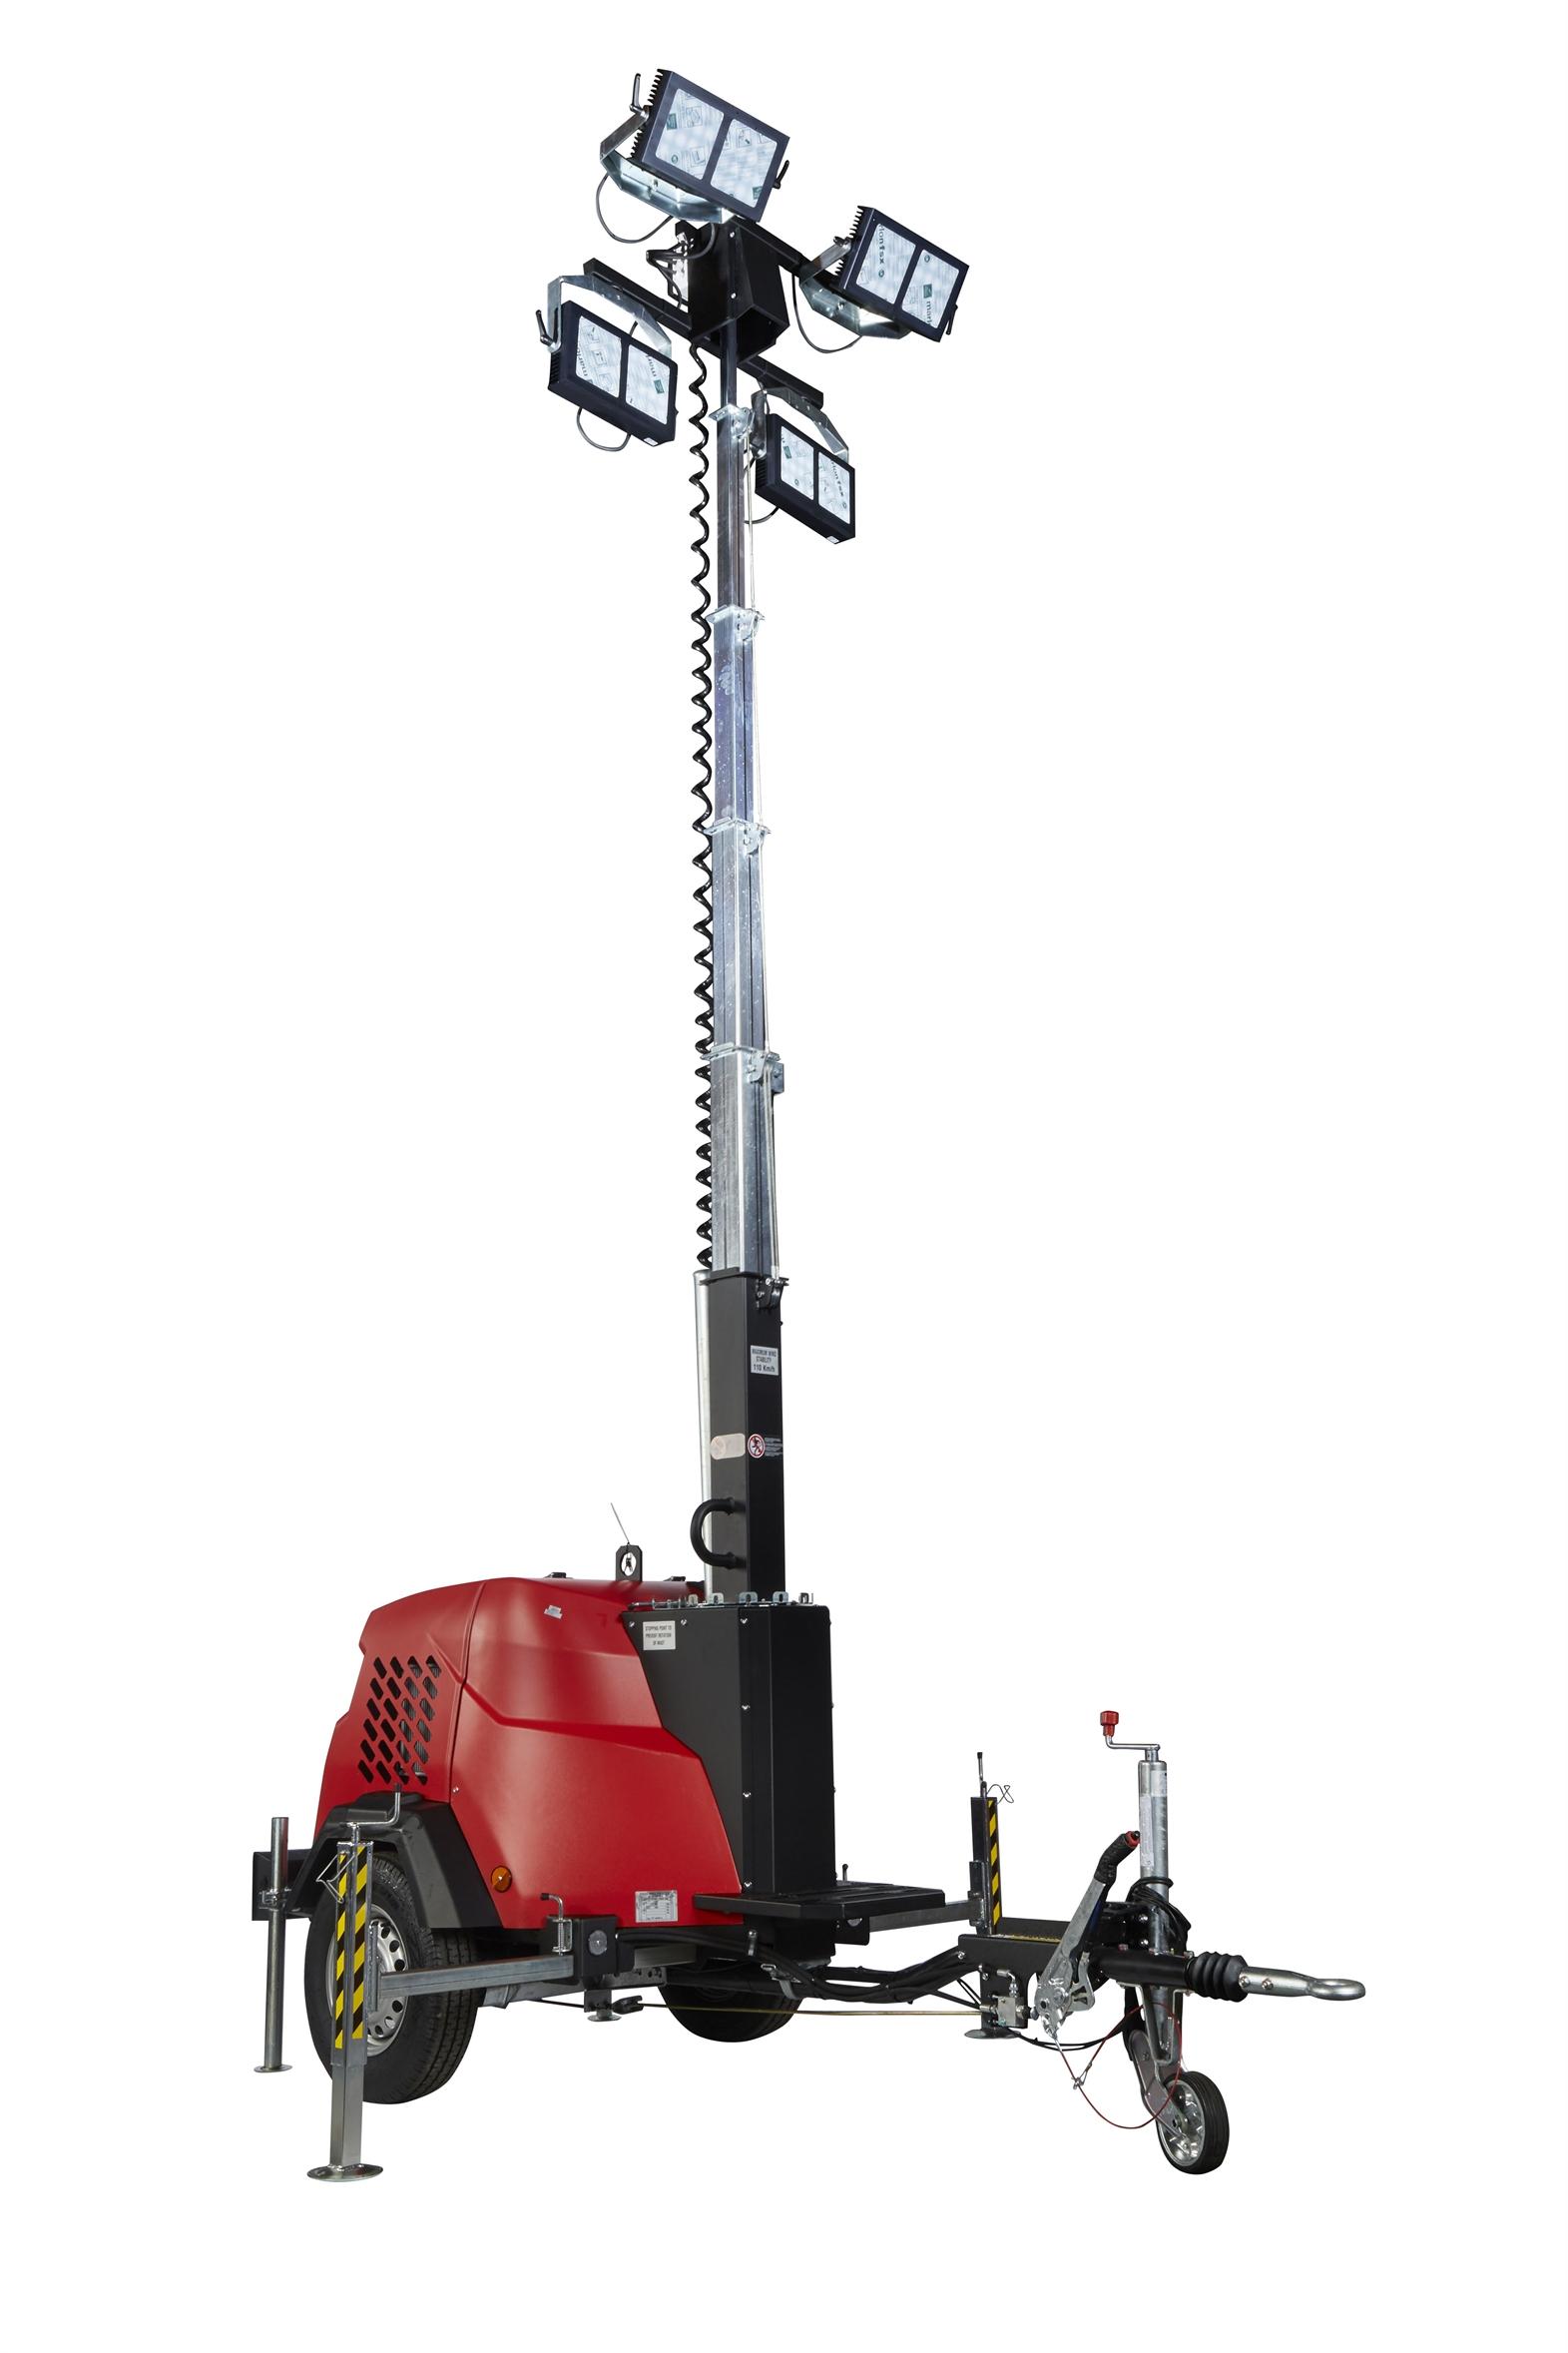 VB9Plus-lighting-tower-22-0089.jpg